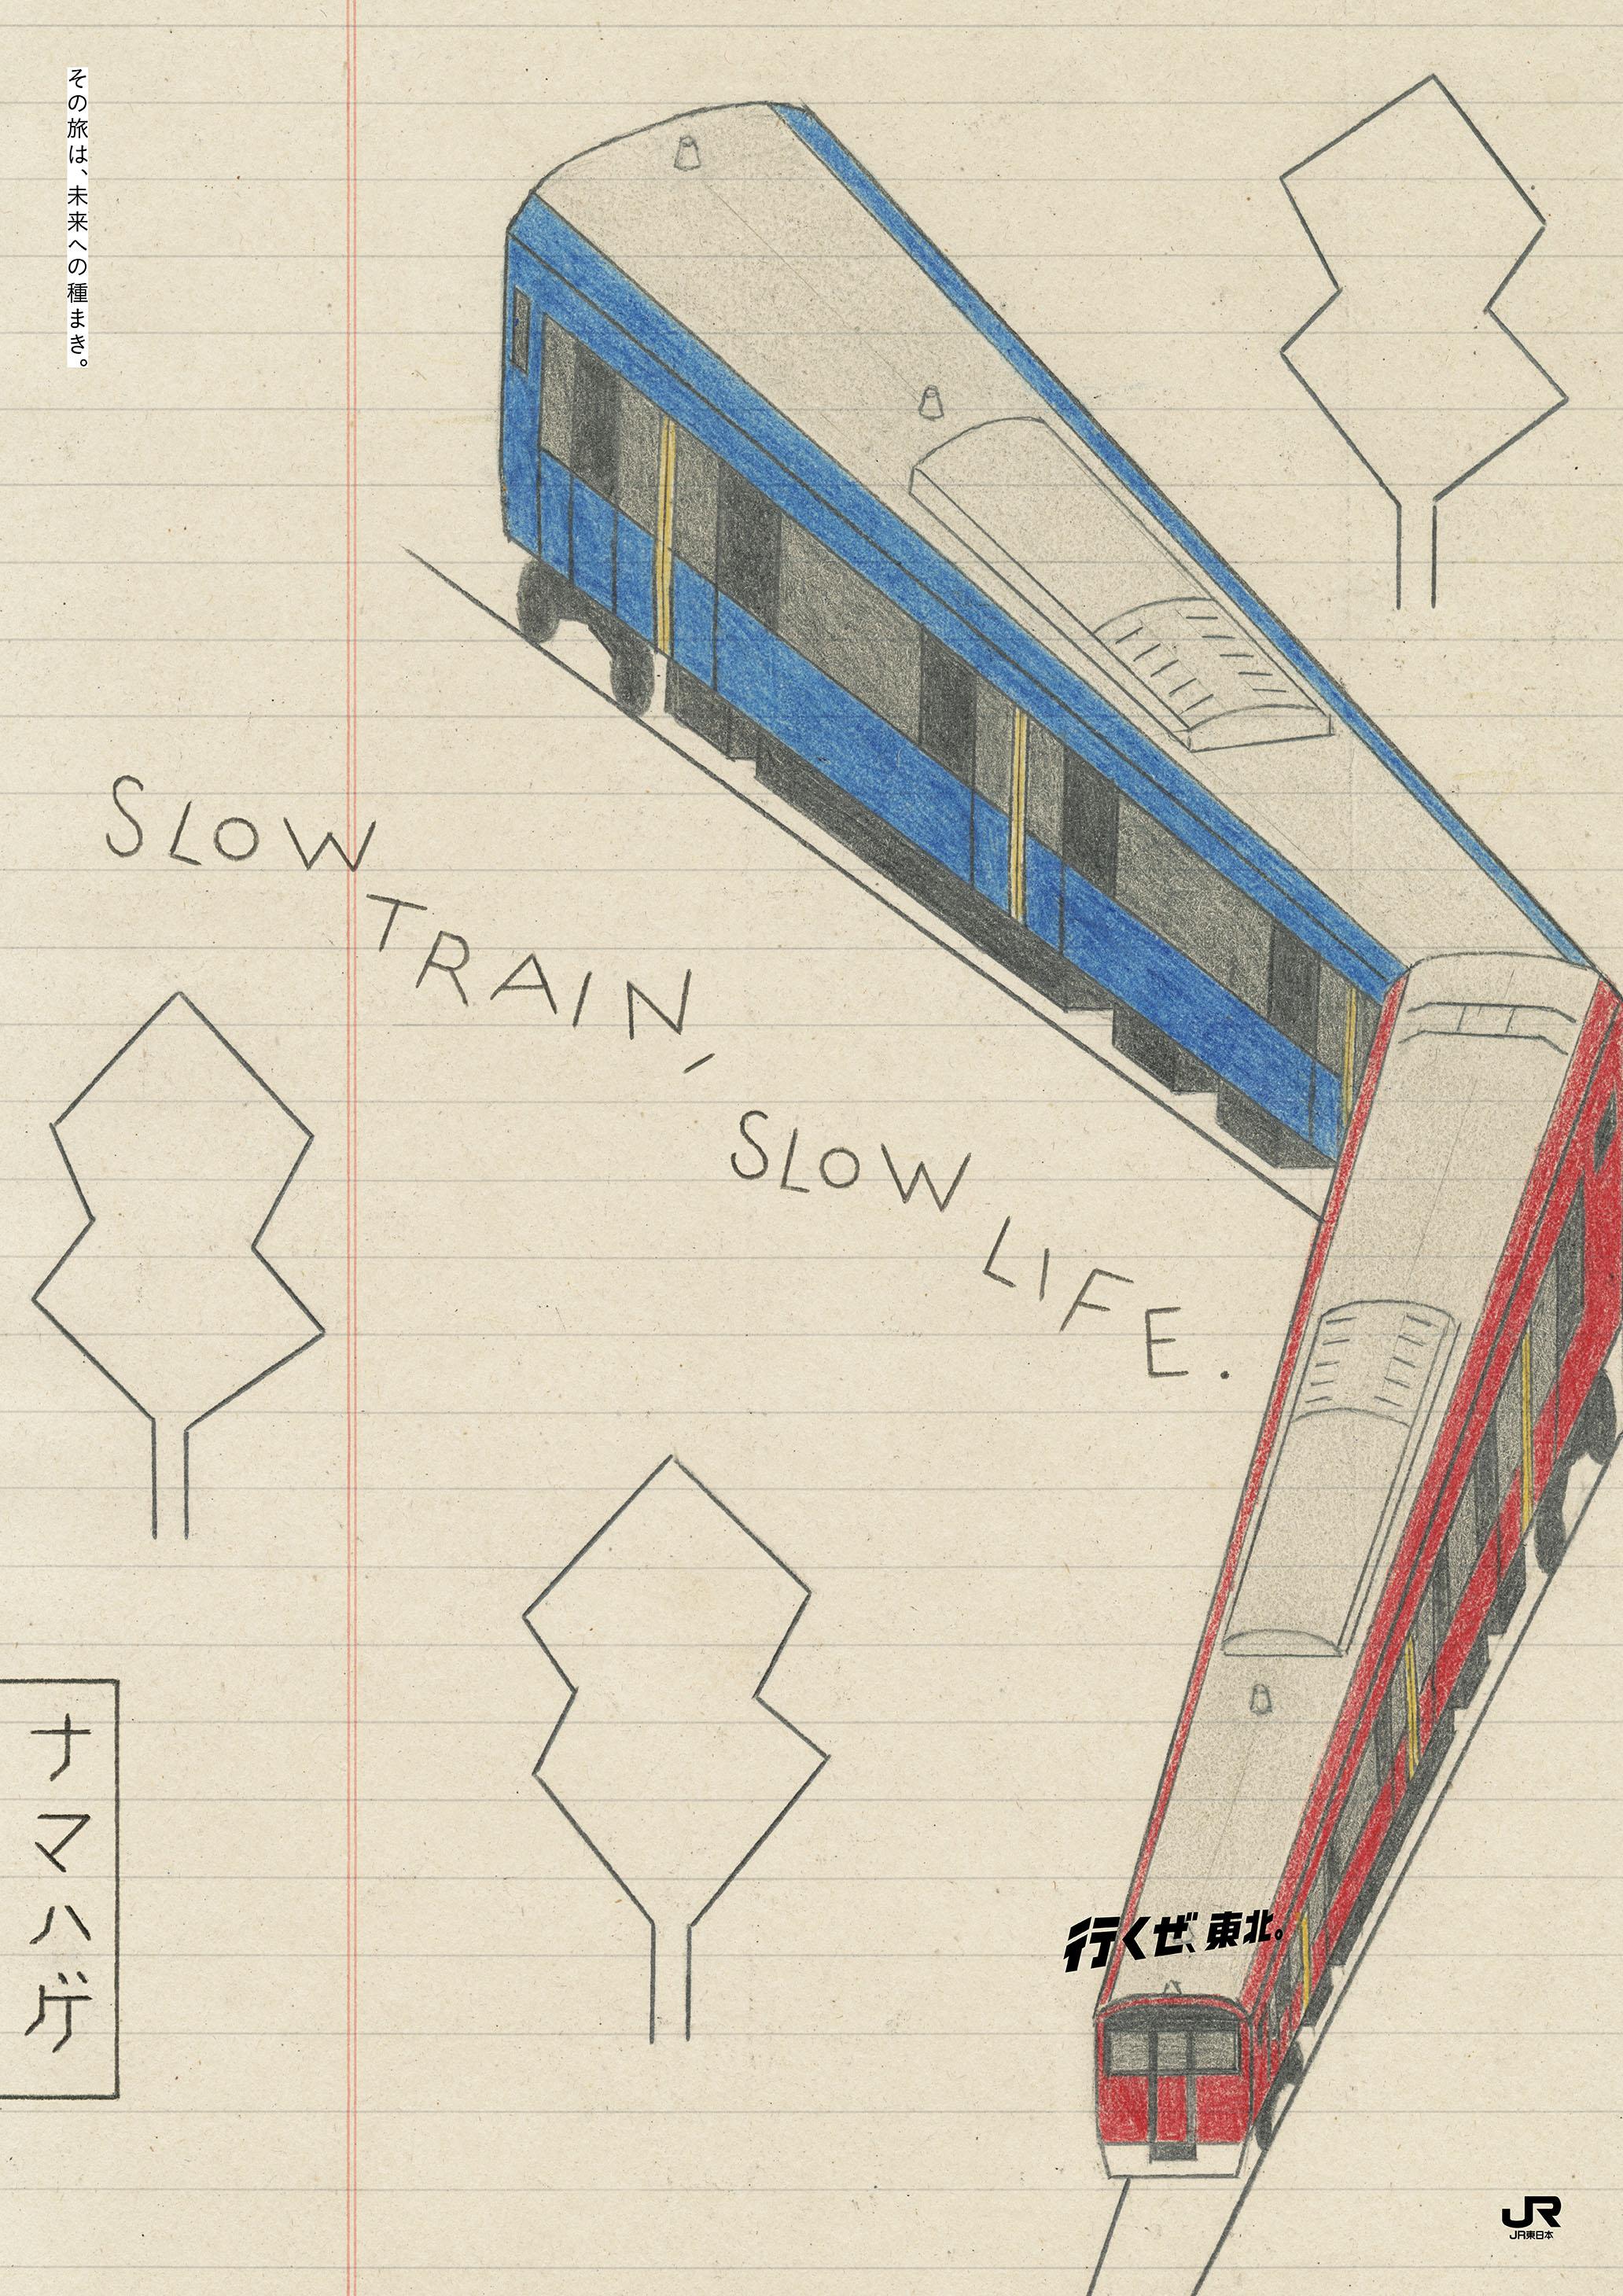 JR_slowtrainslowlife2017_B1_namahage_170606_fin_ol